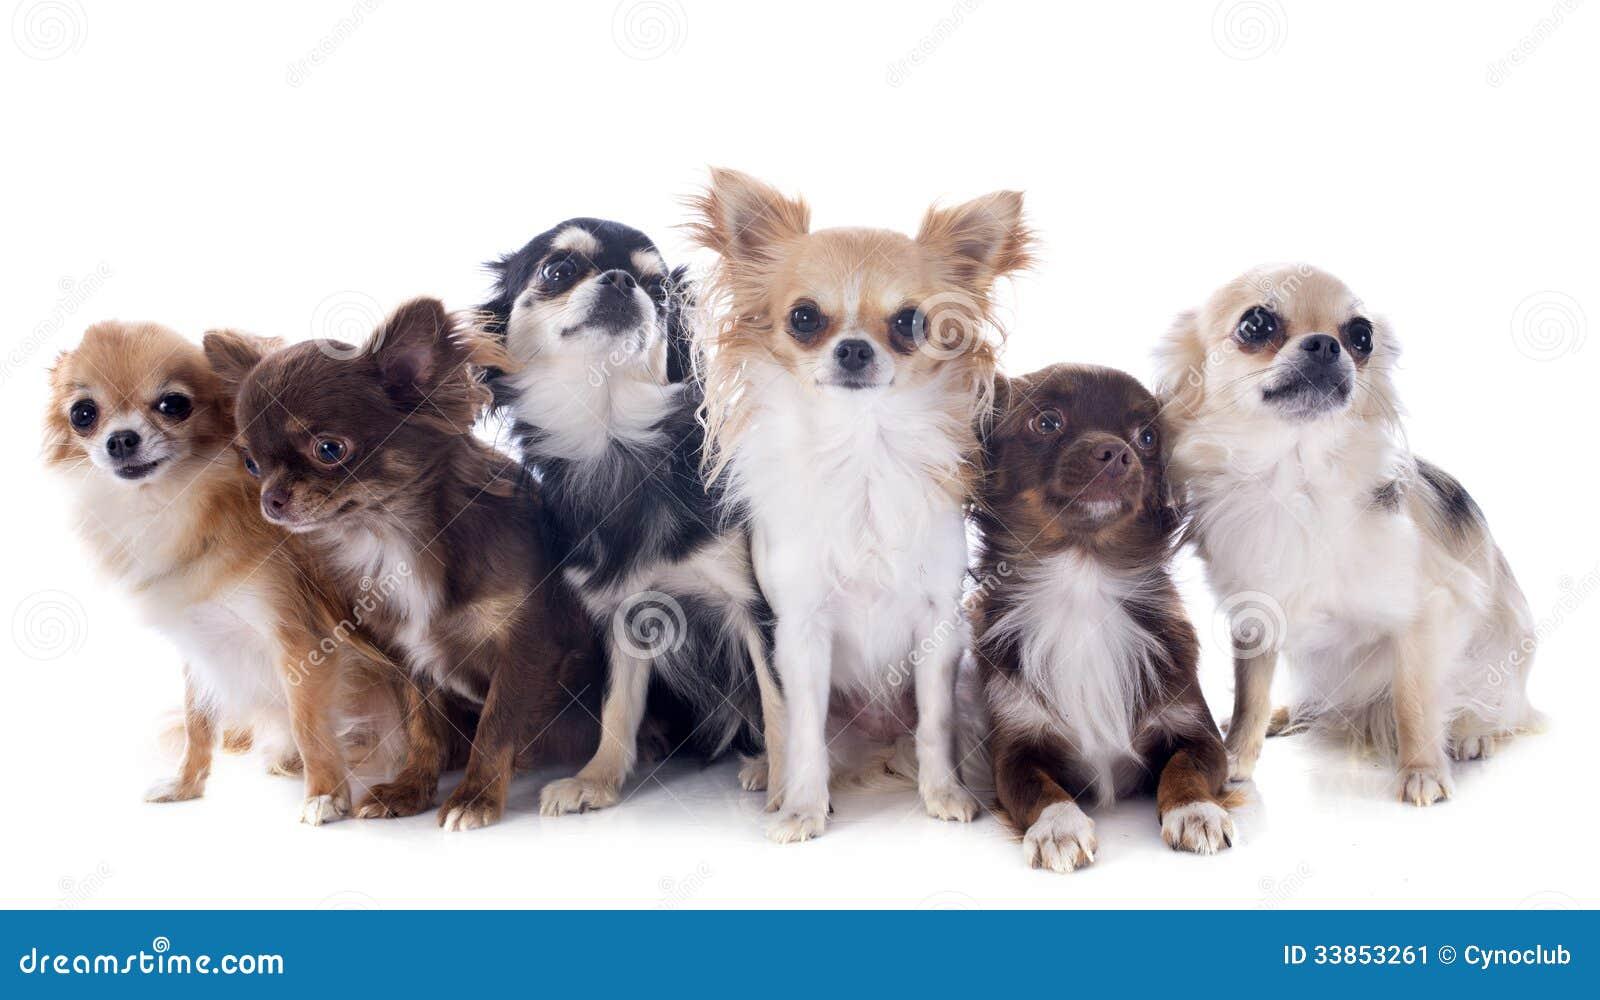 Small Pedigree Dog Breeds